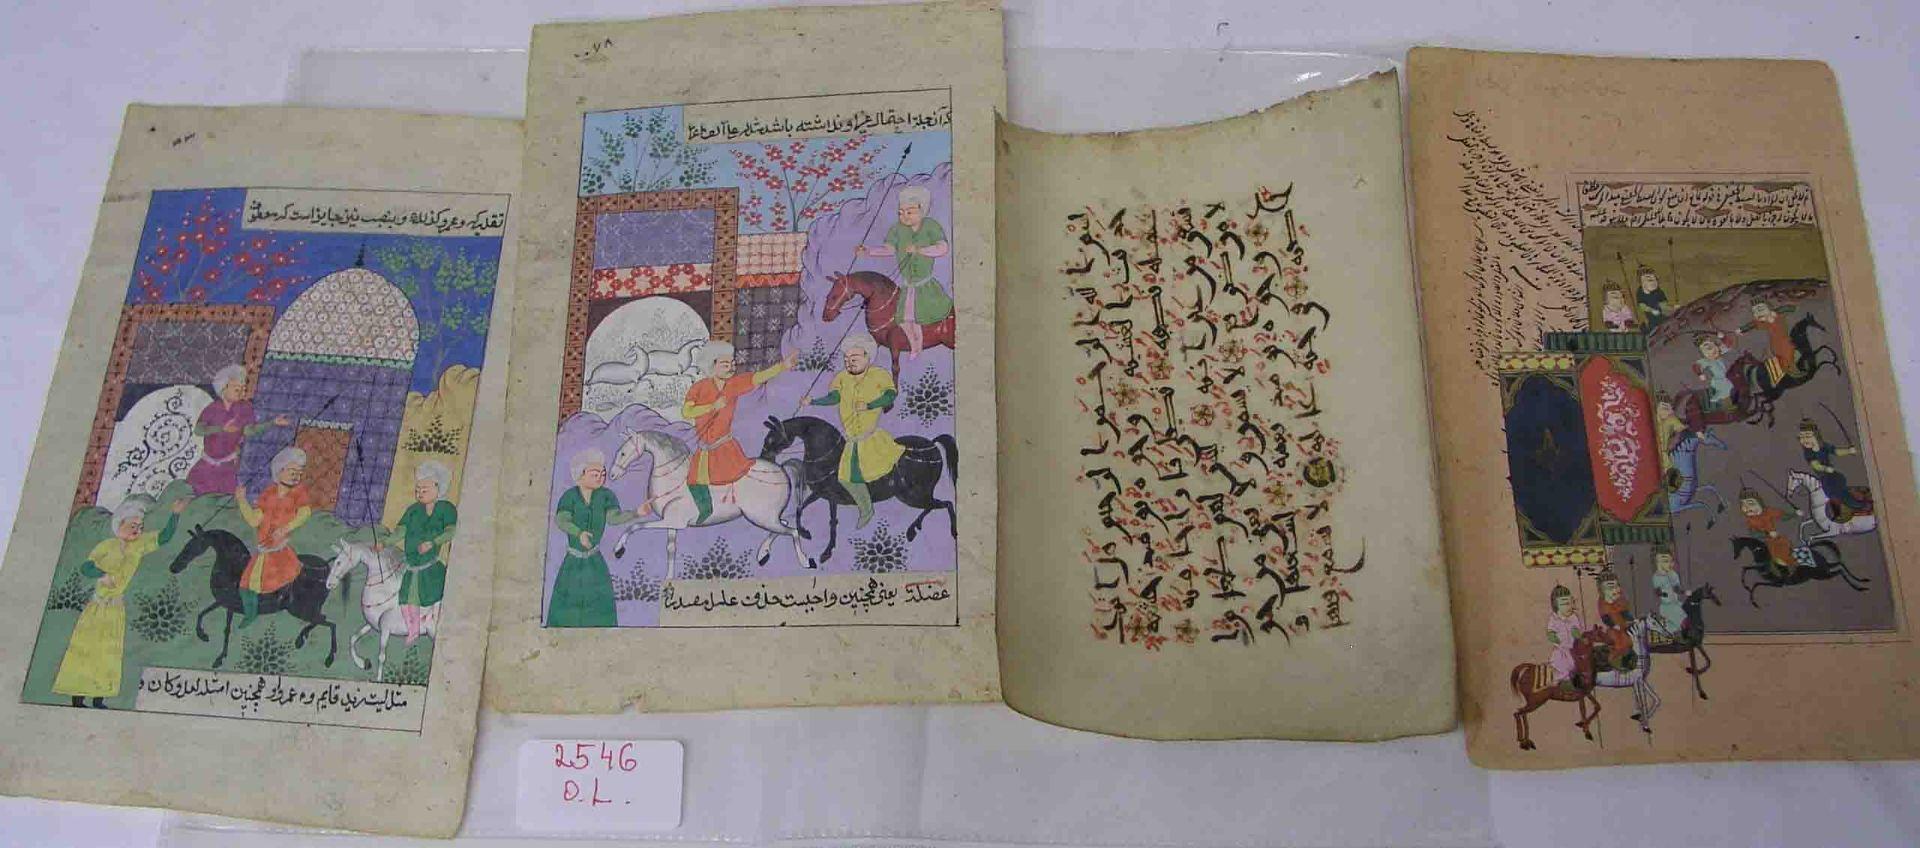 Vier Textblätter, Persien 18. Jh. Drei